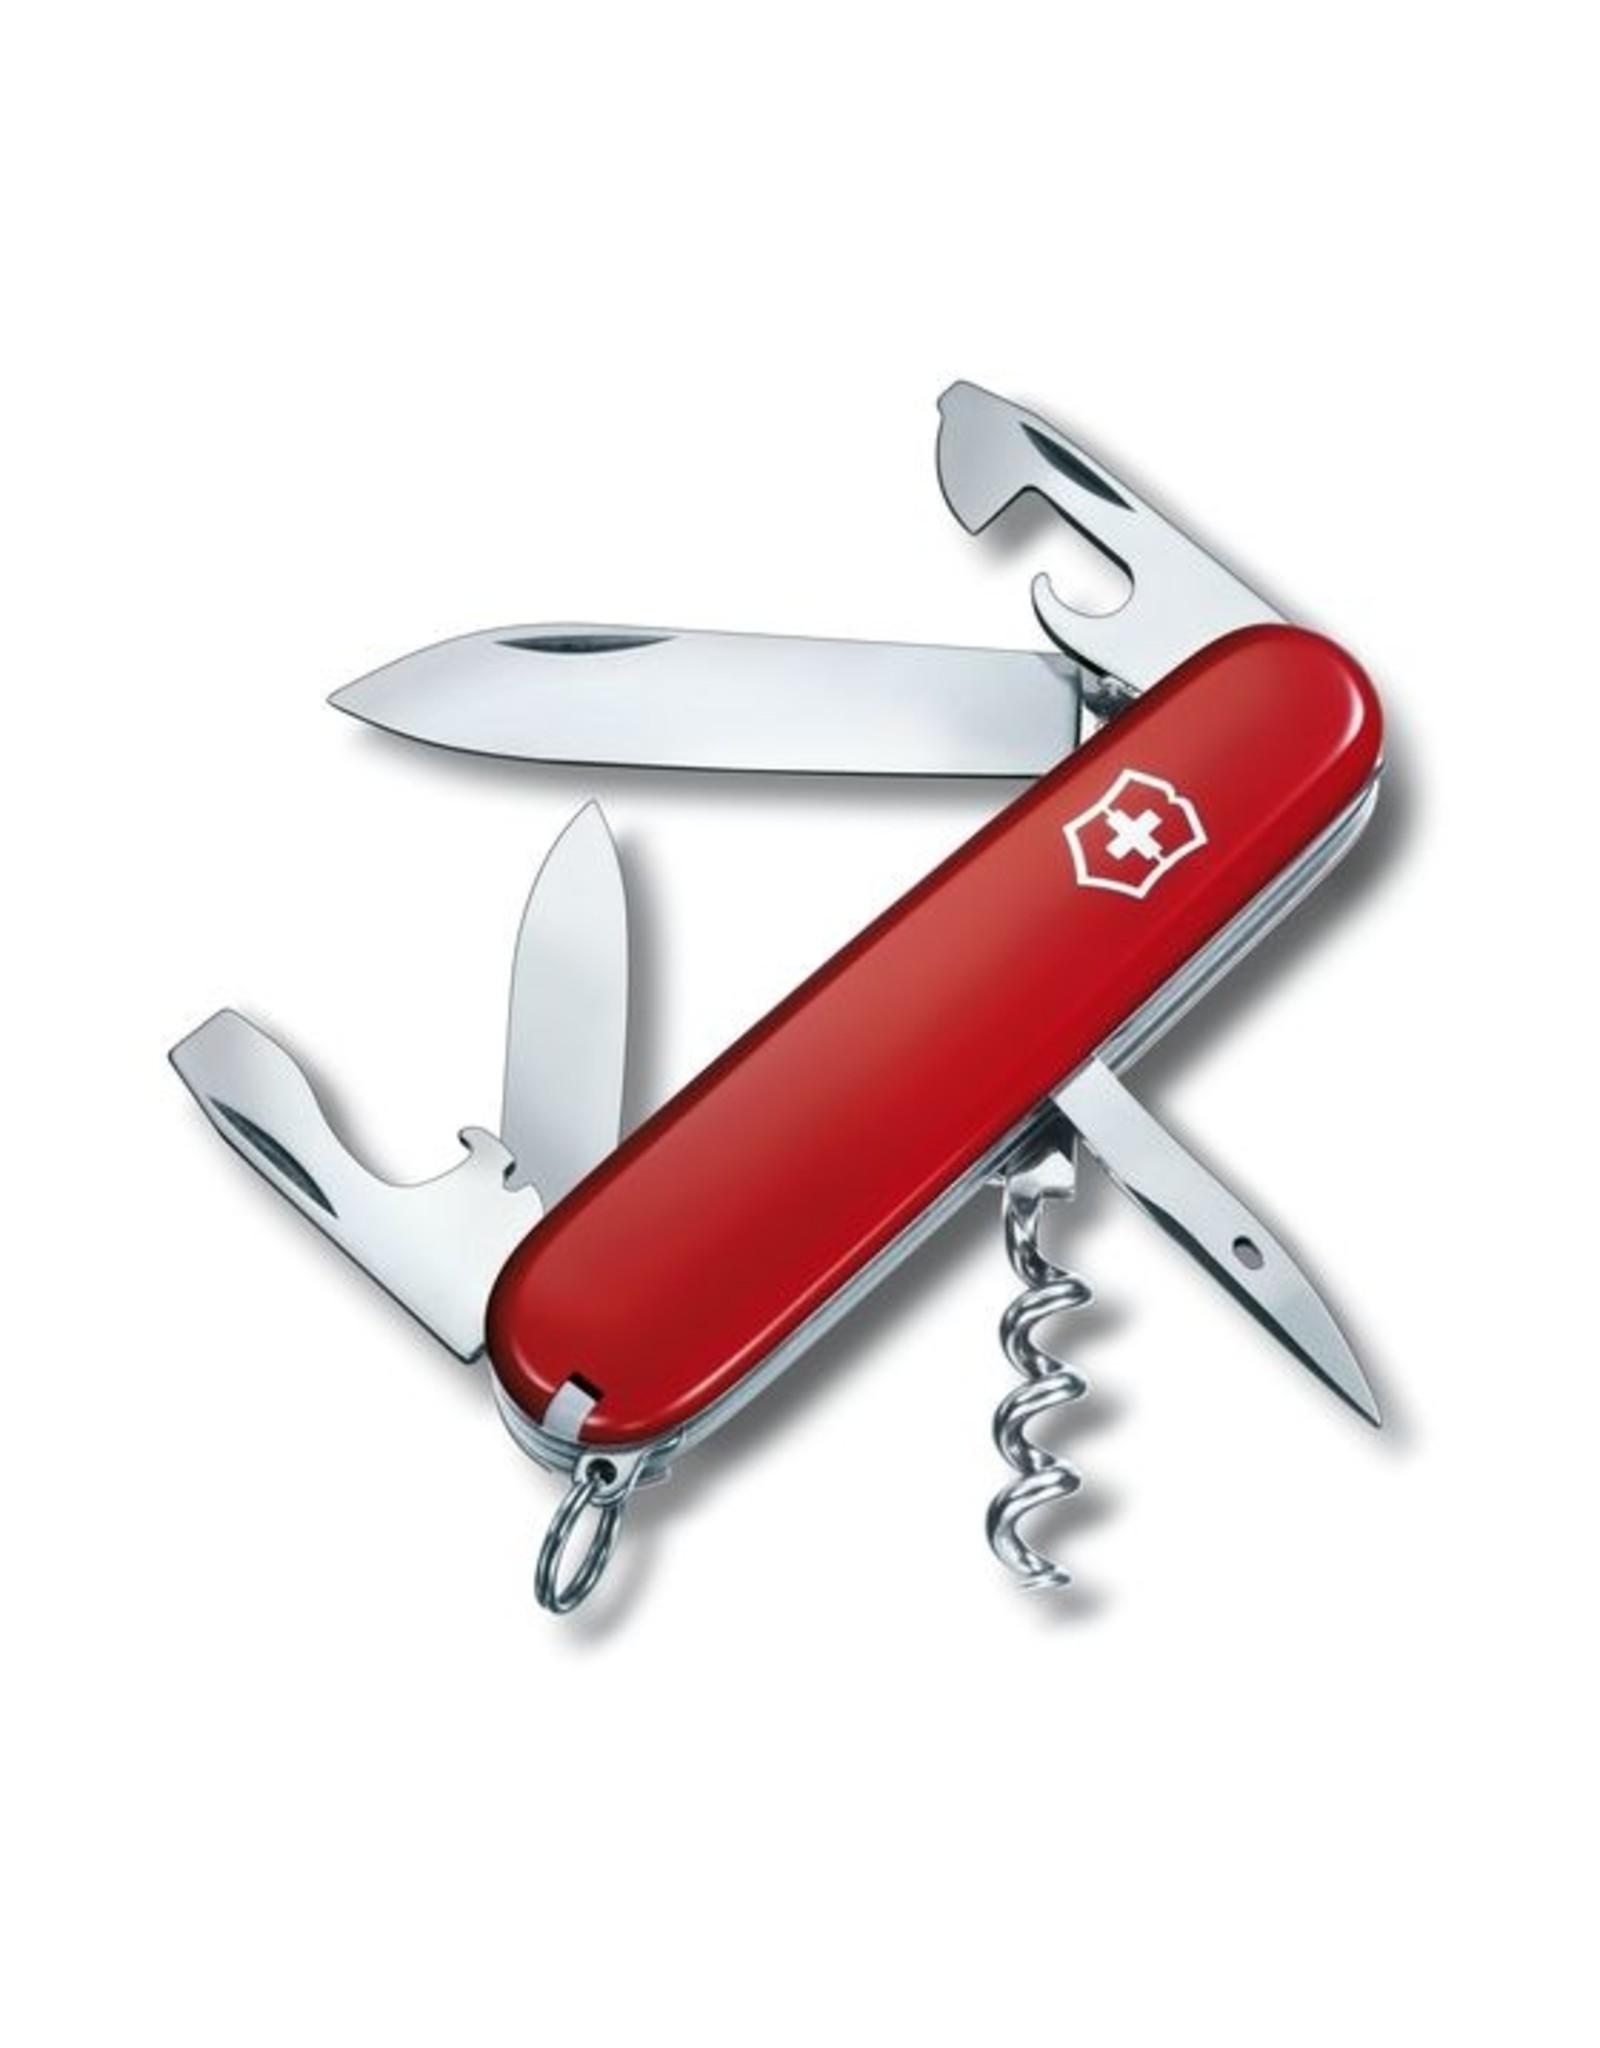 VICTORINOX SWISS ARMY SPARTAN KNIFE, RED